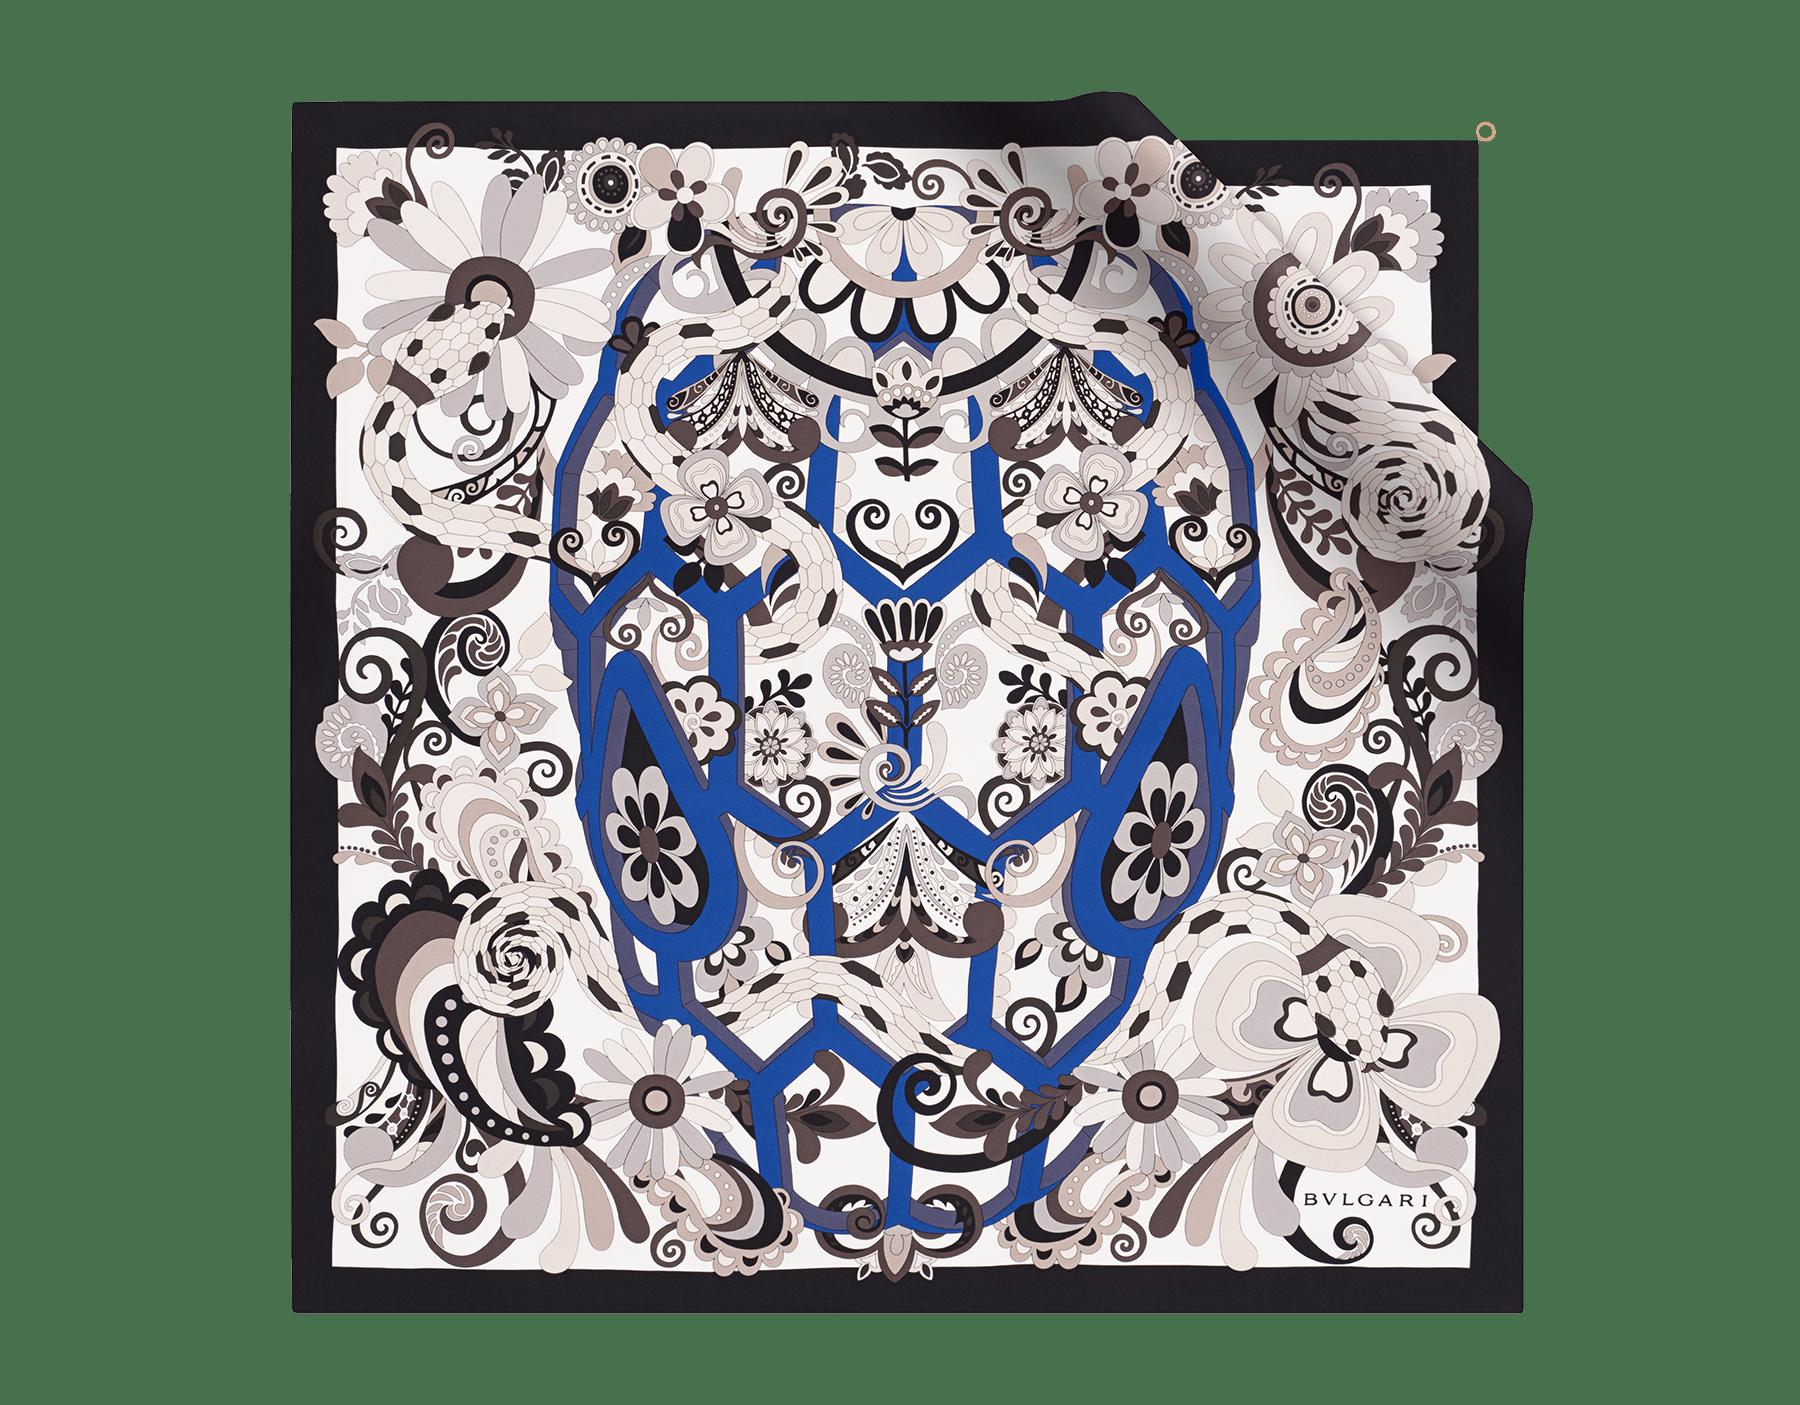 Foulard Serpenti Love Yard noir et bleu en twill de soie fin. 242962 image 1